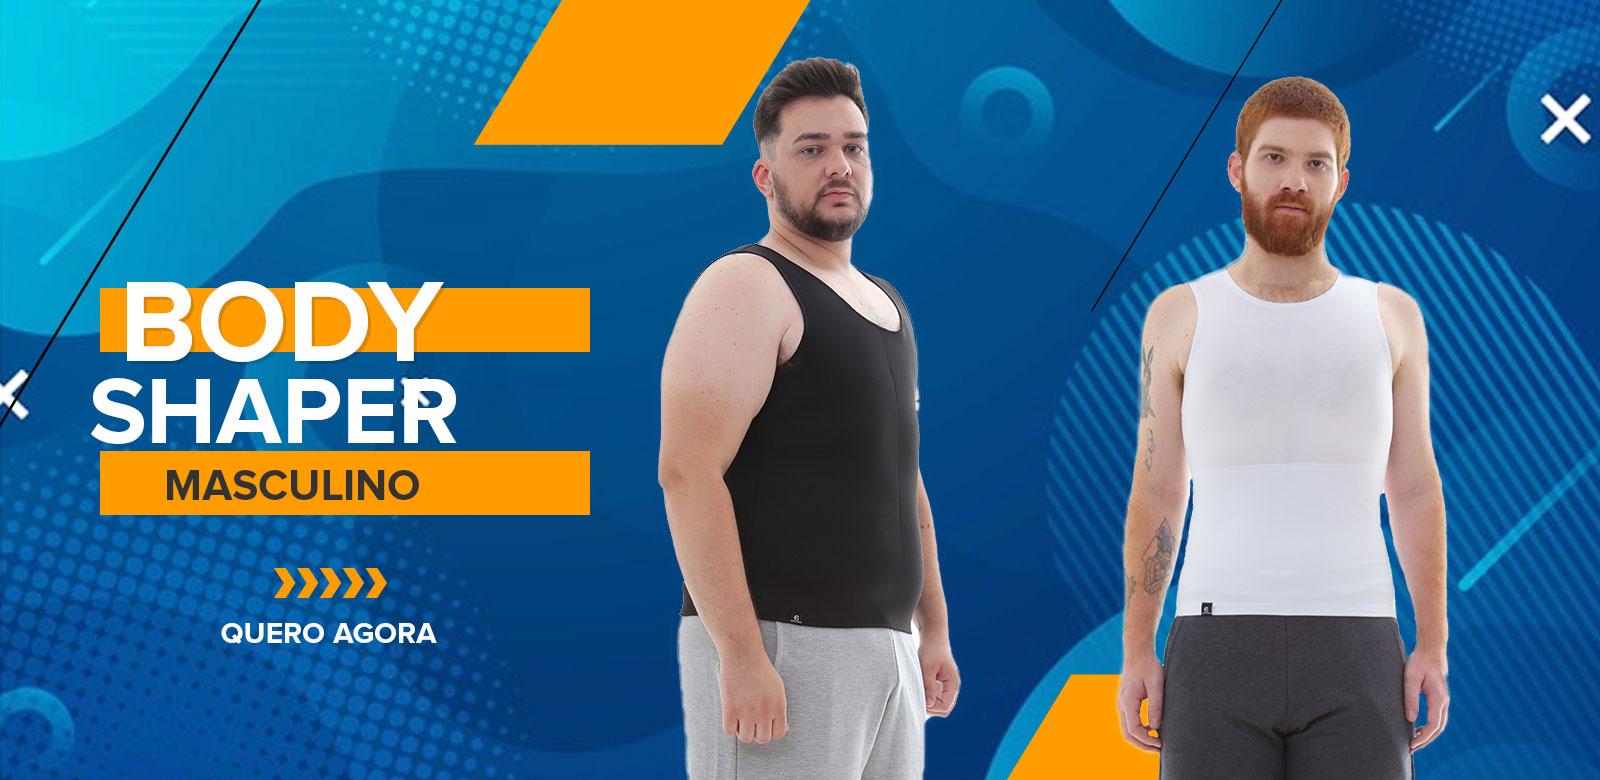 Body Shaper - Masculino